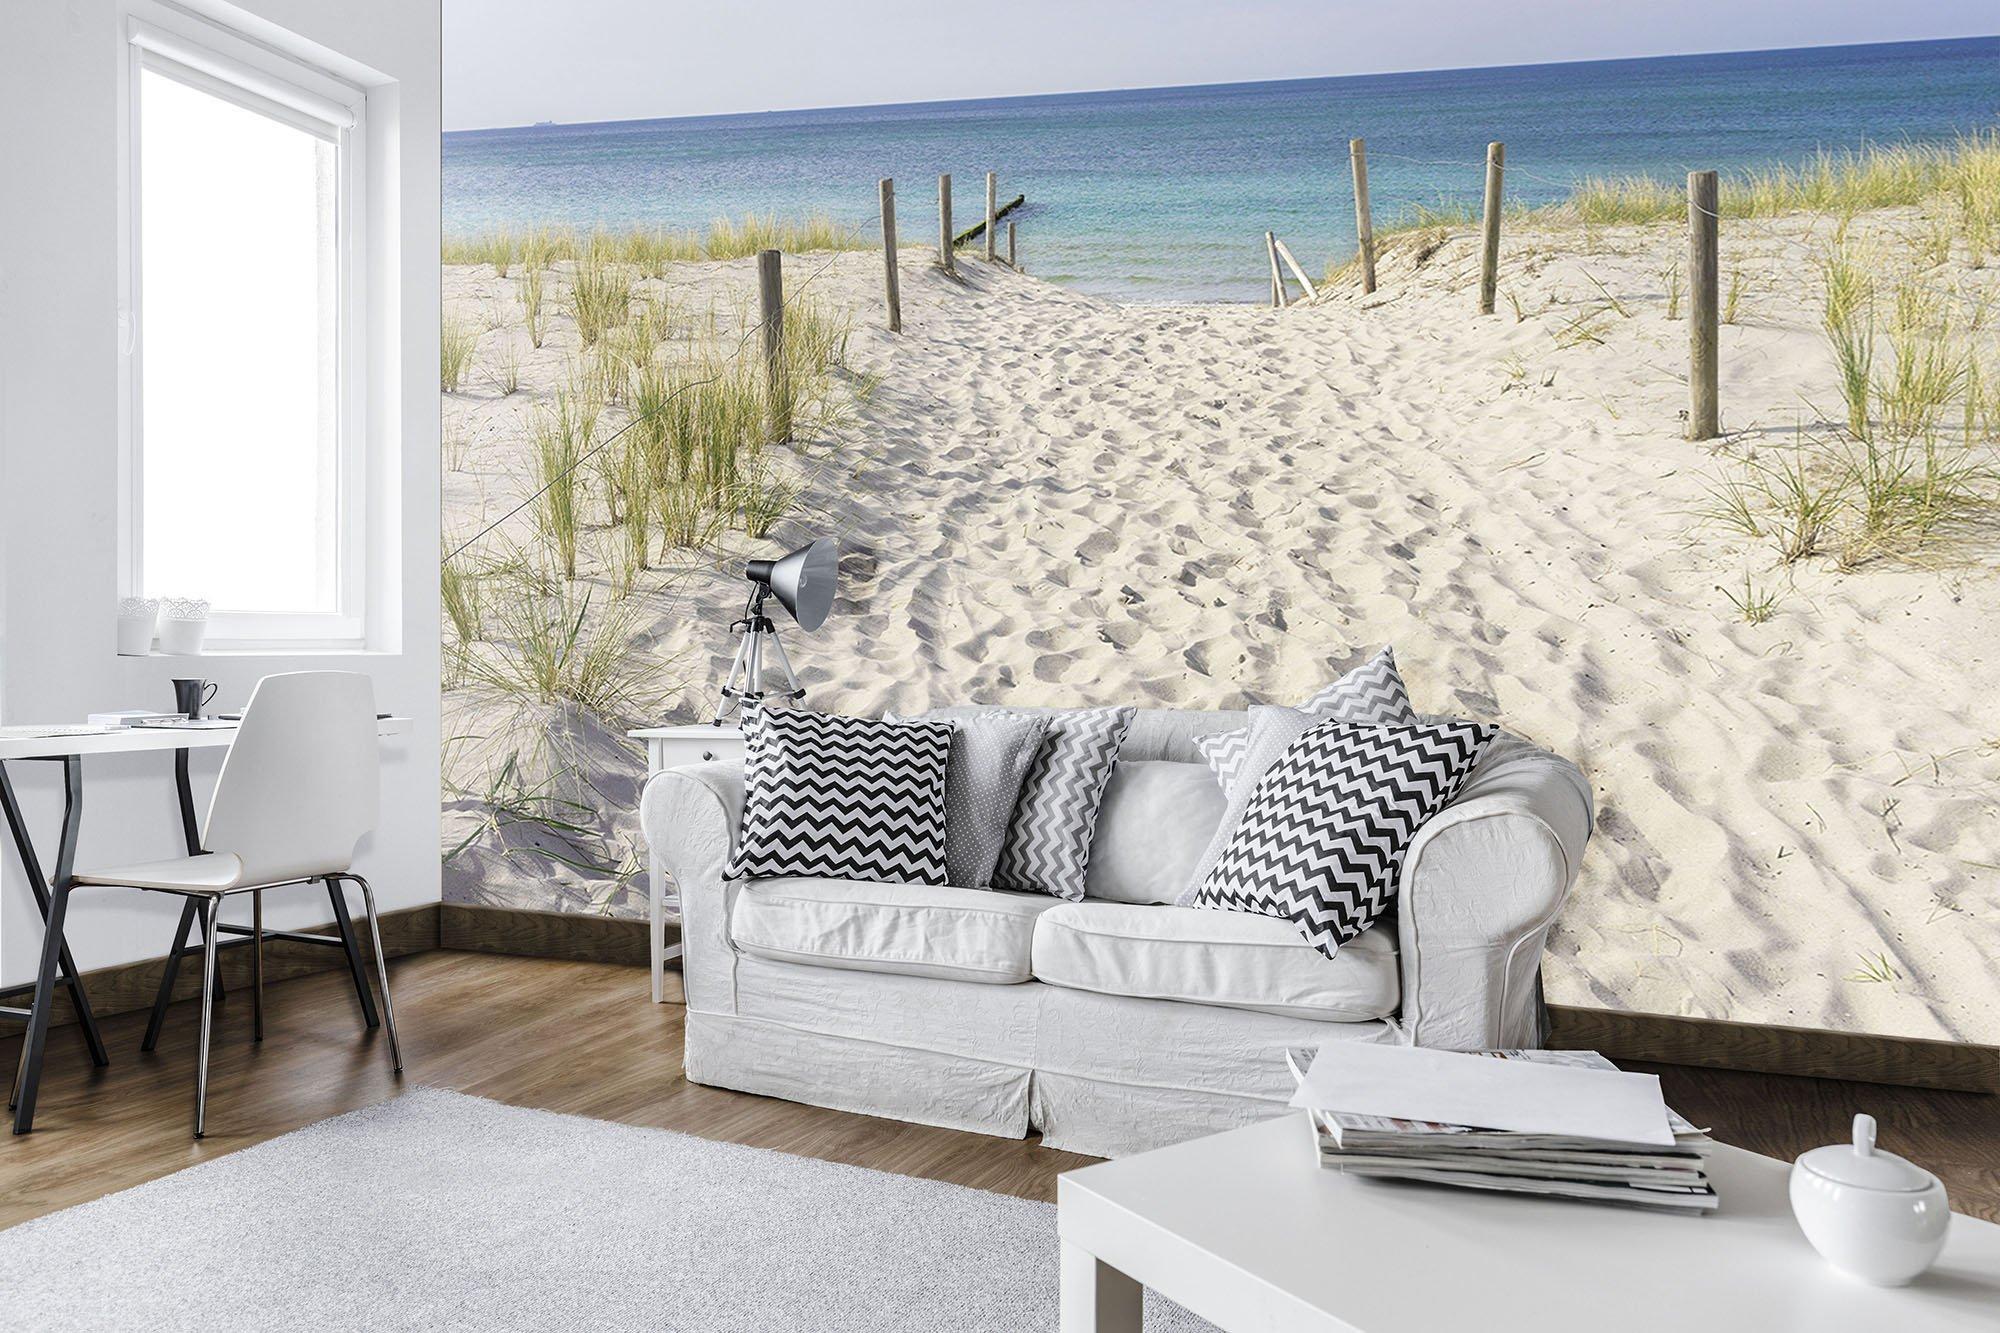 fototapete meerblick und d nen weltderbilder. Black Bedroom Furniture Sets. Home Design Ideas